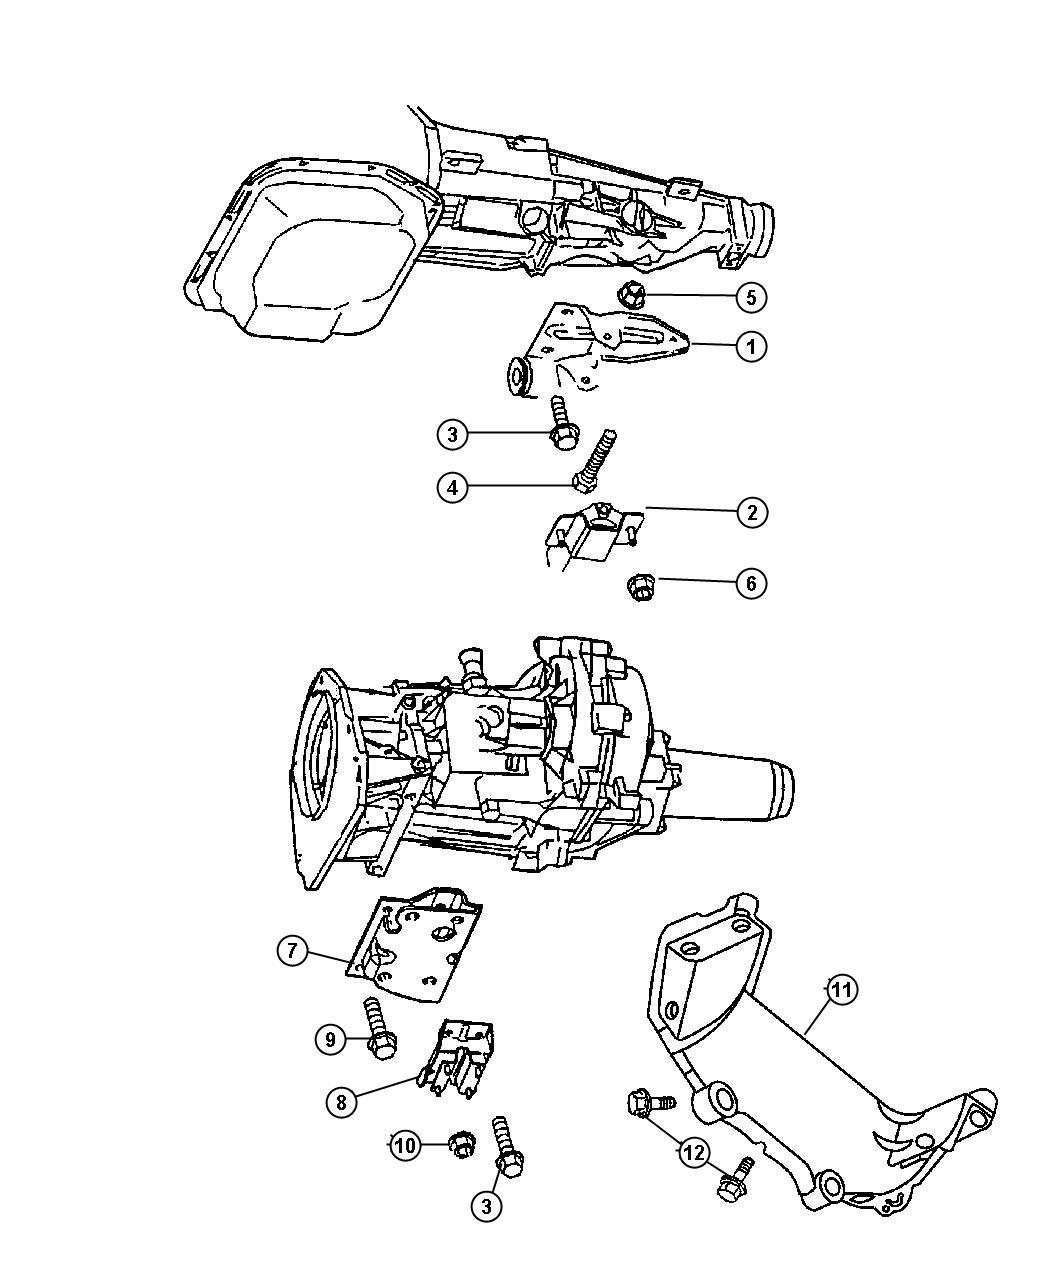 Dodge Durango Engine Mounting Rear 4 7l Eng